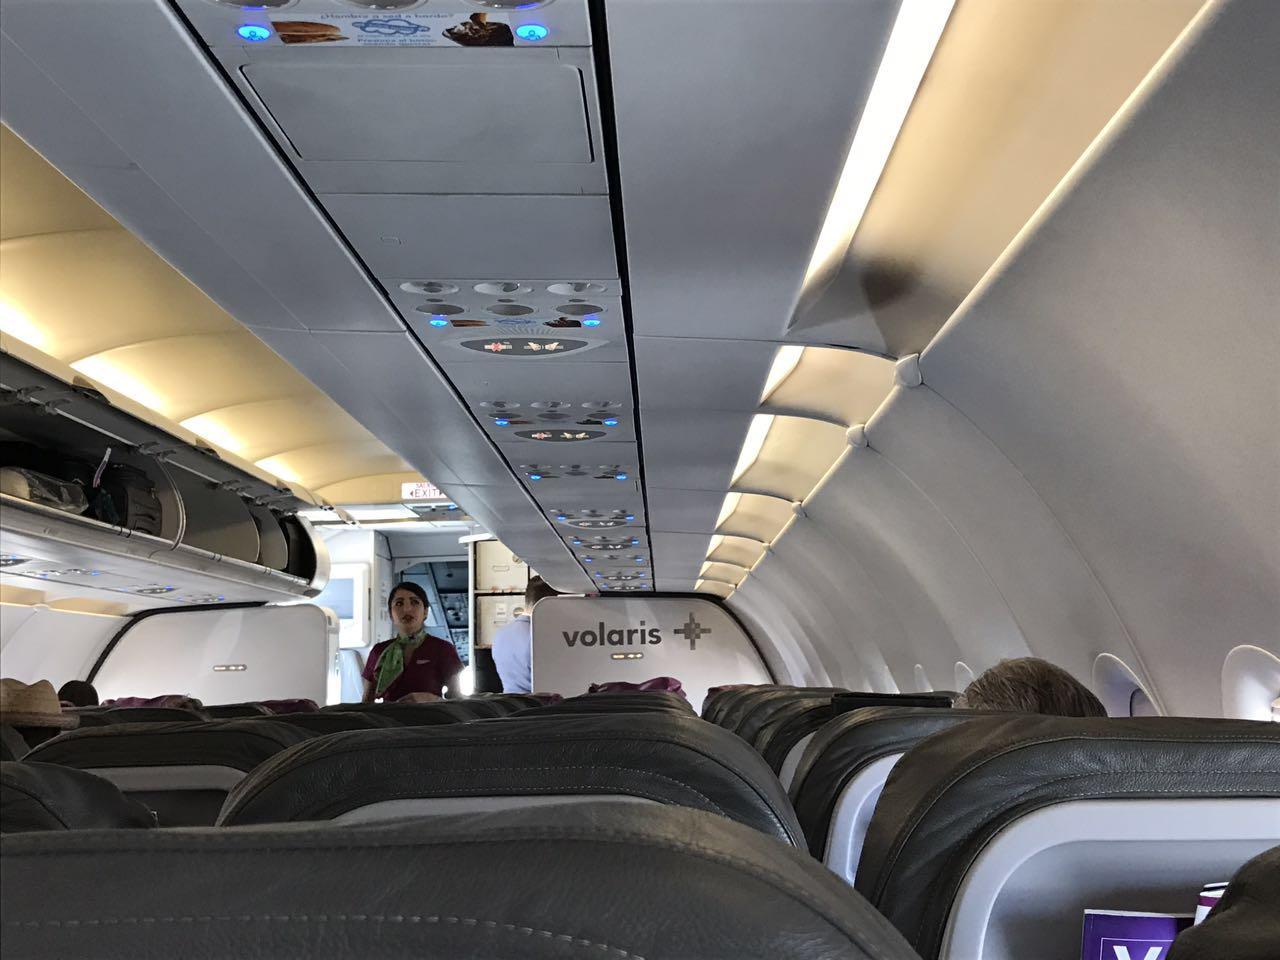 Volaris 航空正名贴 (大大的表扬)